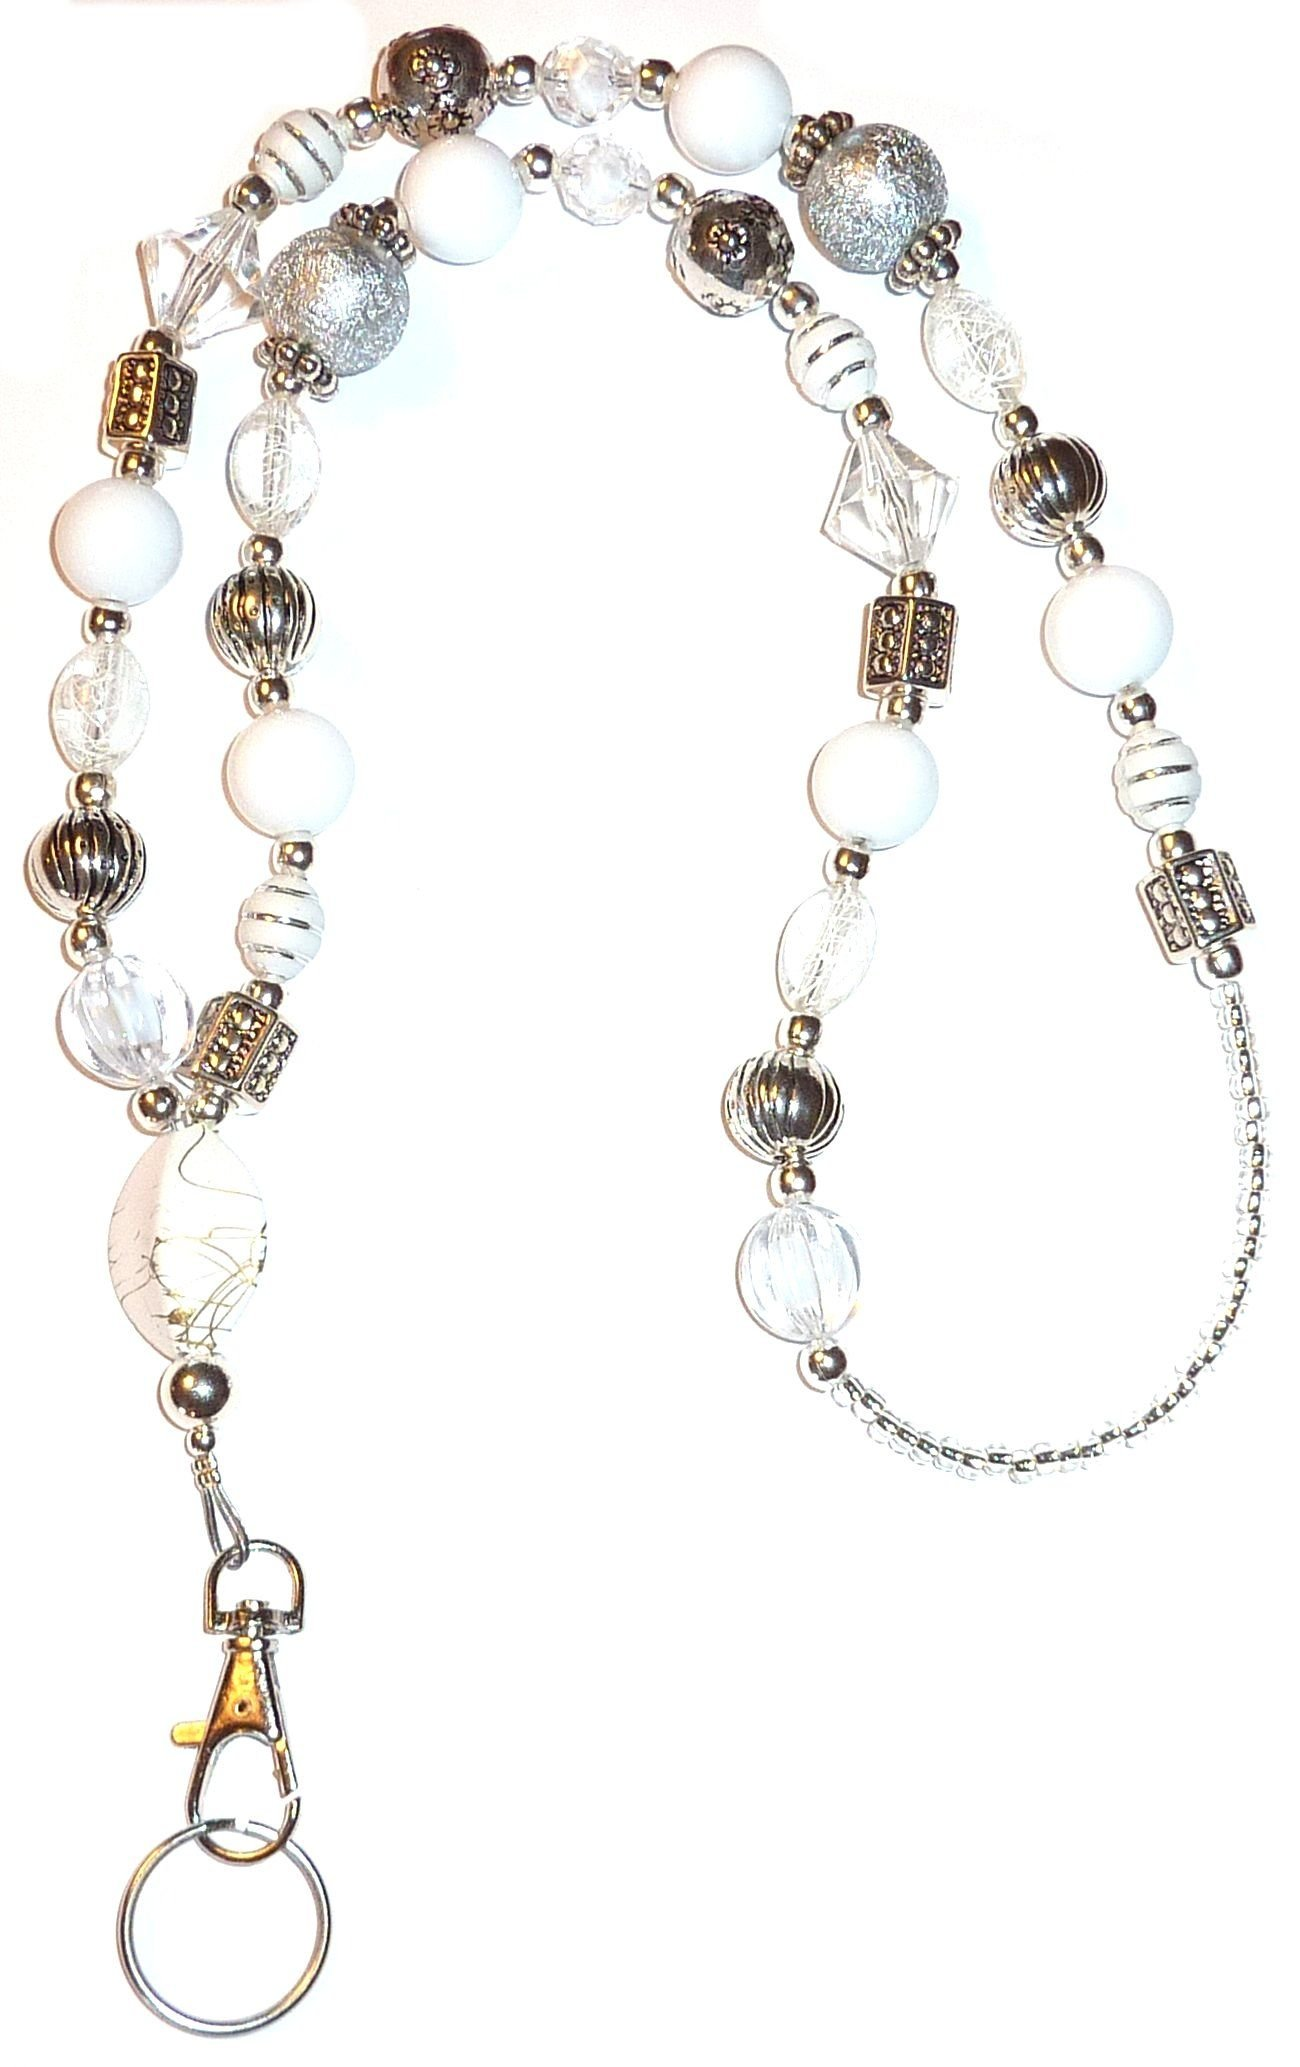 Chunky Style Fashion Women's Beaded Lanyard 34'', Breakaway and Non breakaway available, For Keys, Badge Holder (Chunky White - NON Breakaway (Stronger))